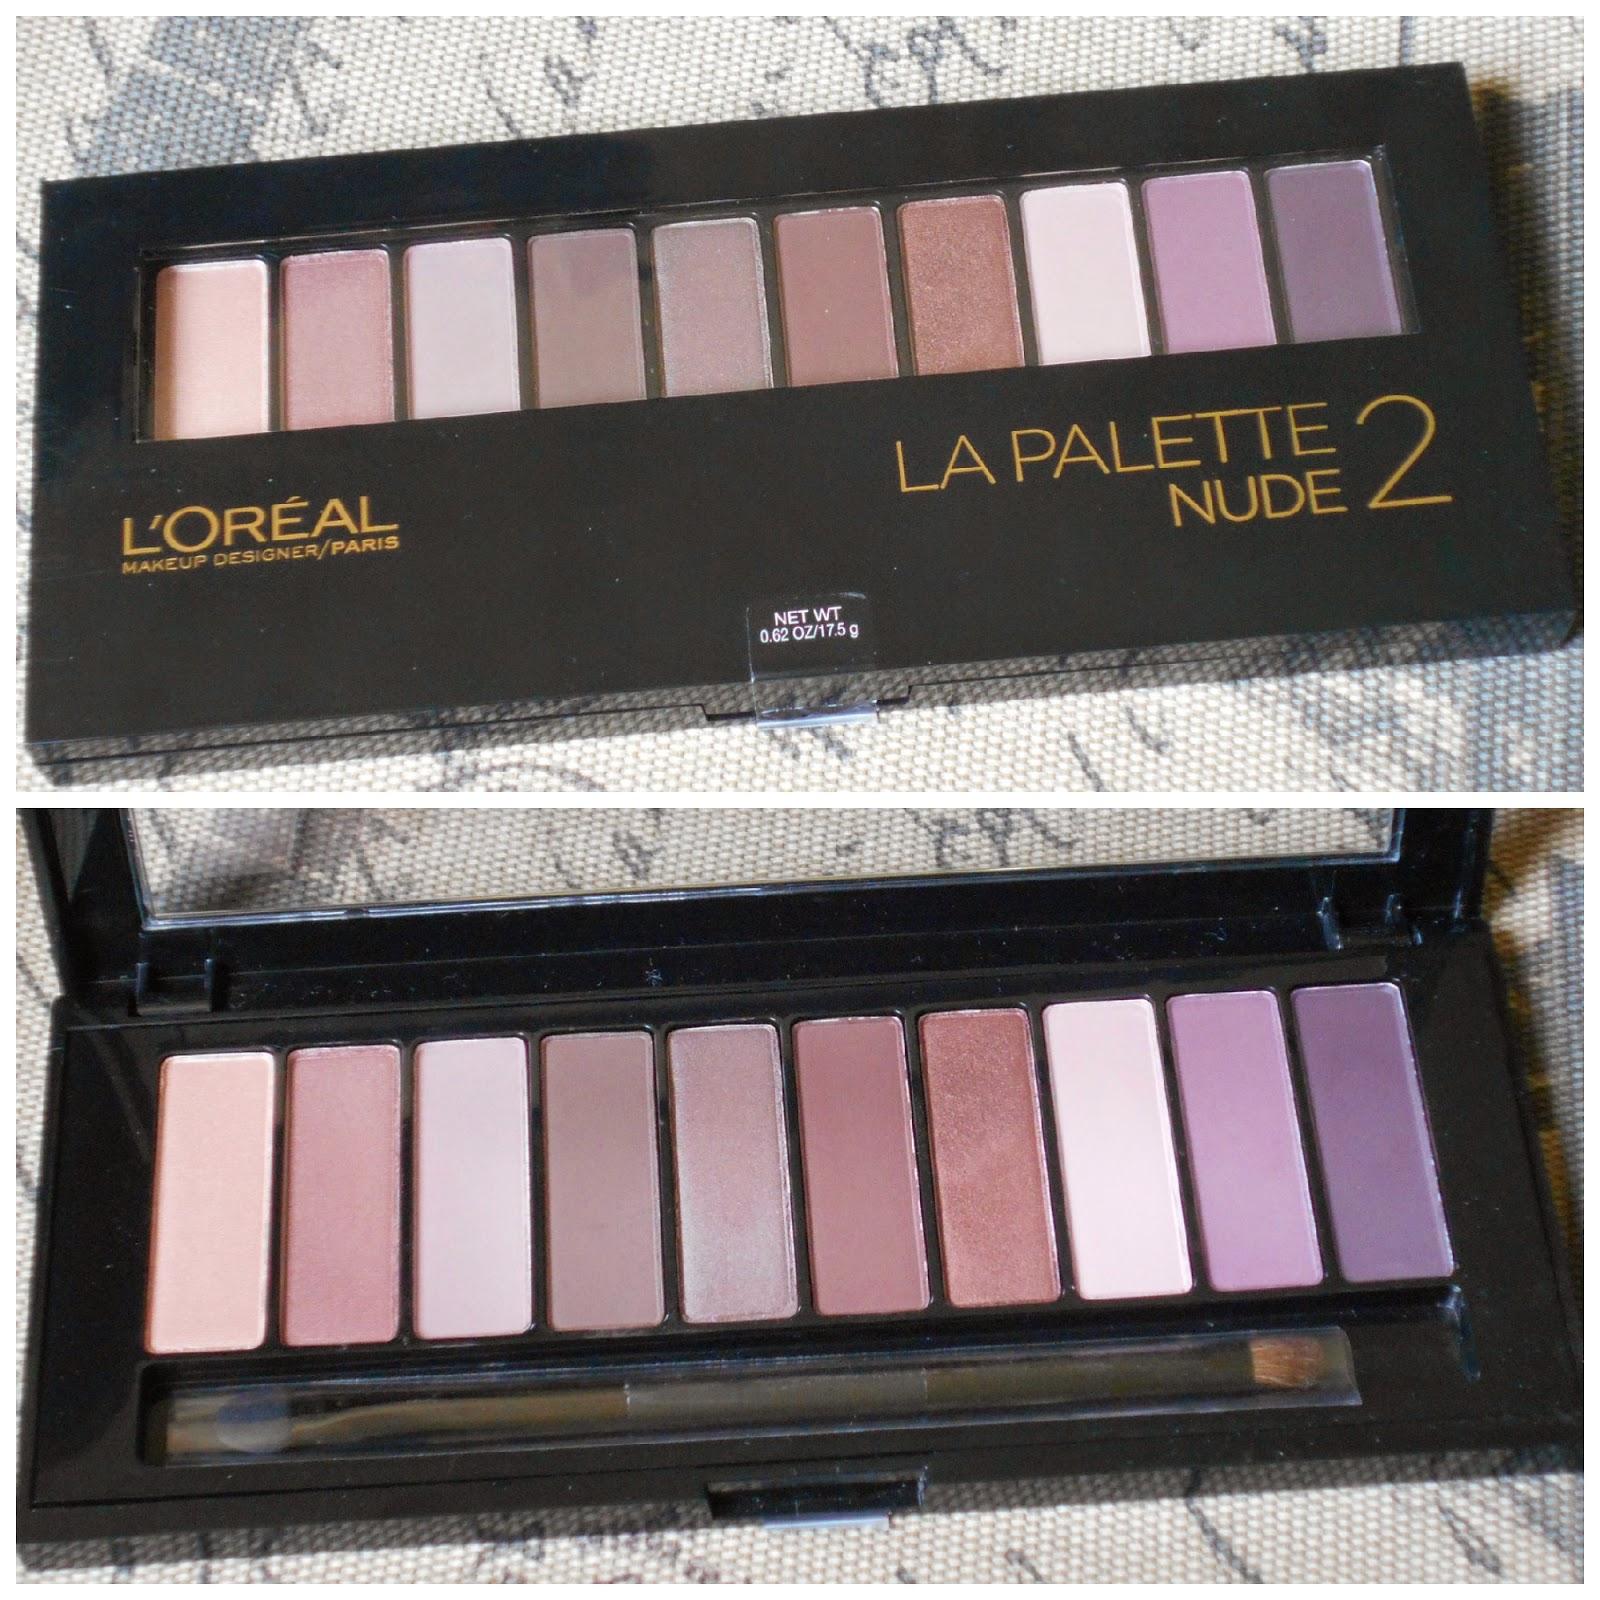 L'Oreal  La Palette Nude 1 & La Palette Nude 2